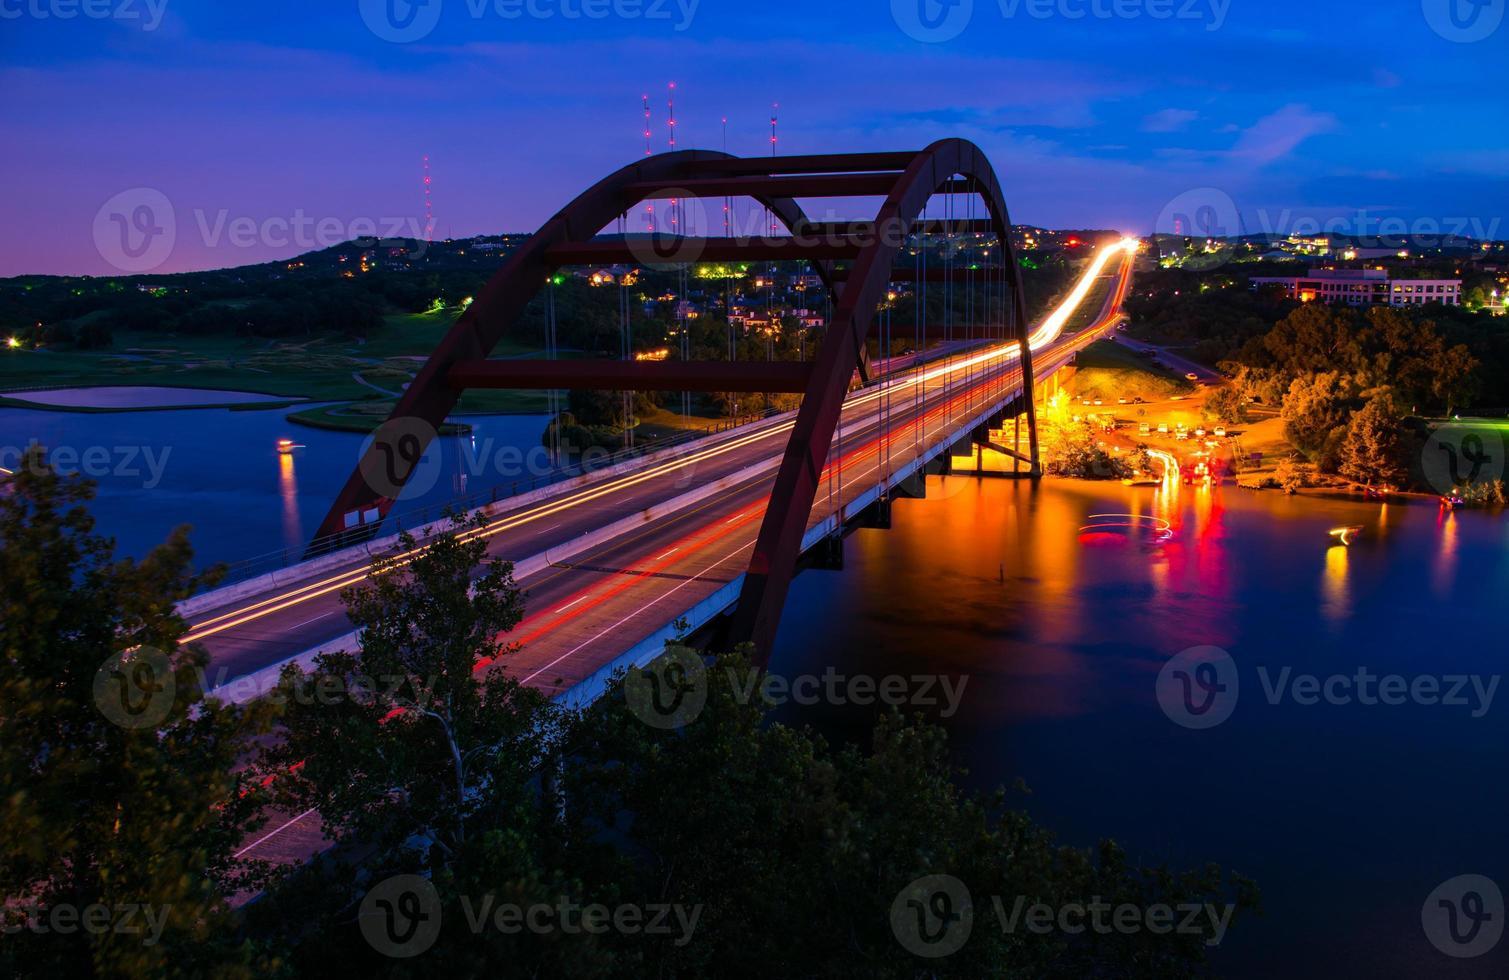 pennybacker loop 360 bridge night shot cerchio illumina austin texas foto